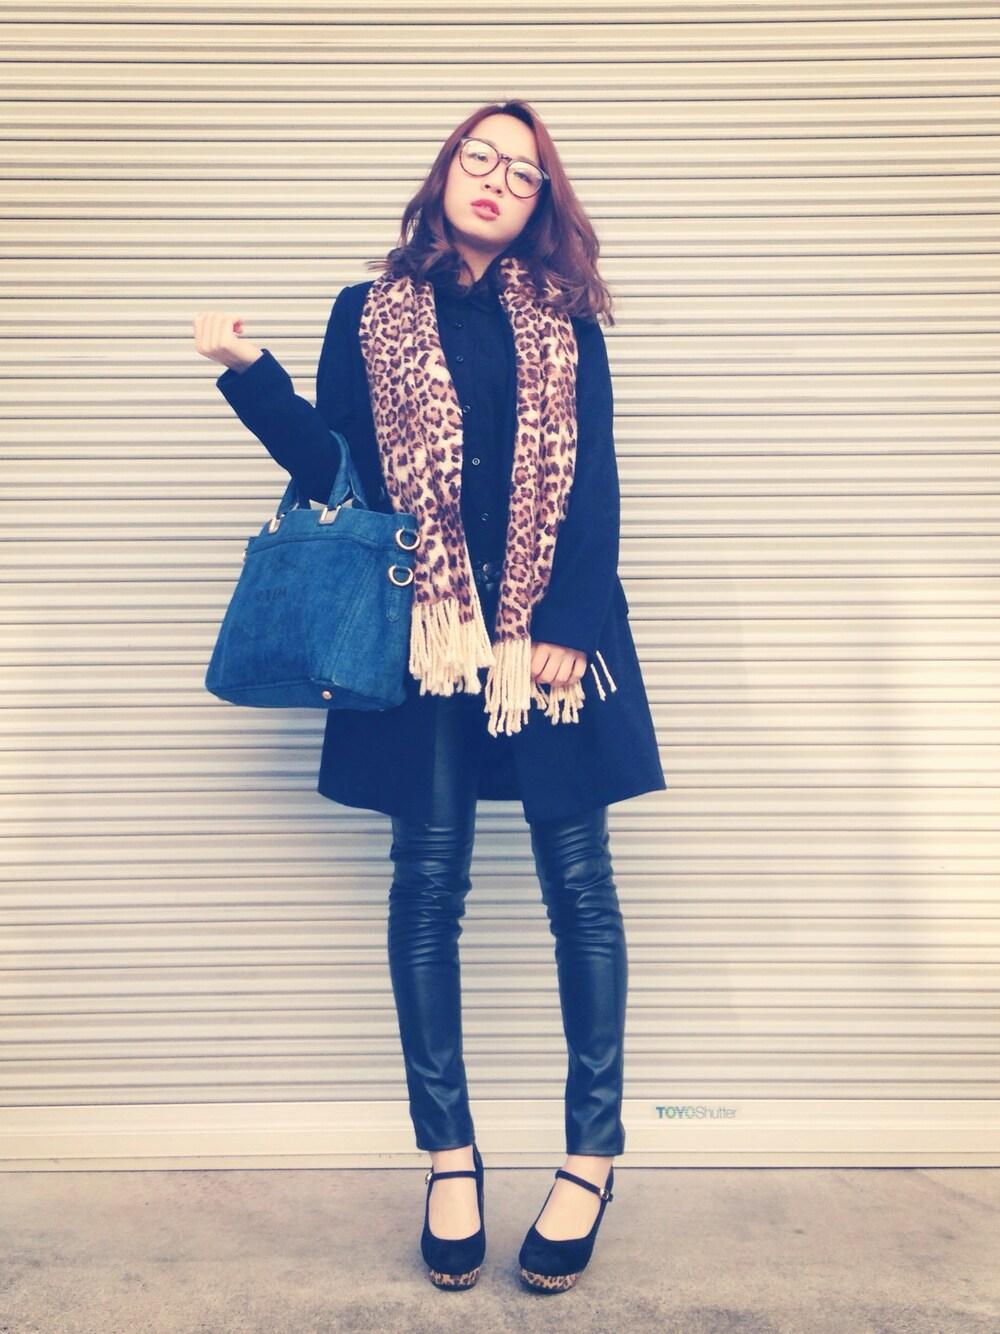 出典:http://wear.jp/sakiiii/182898/